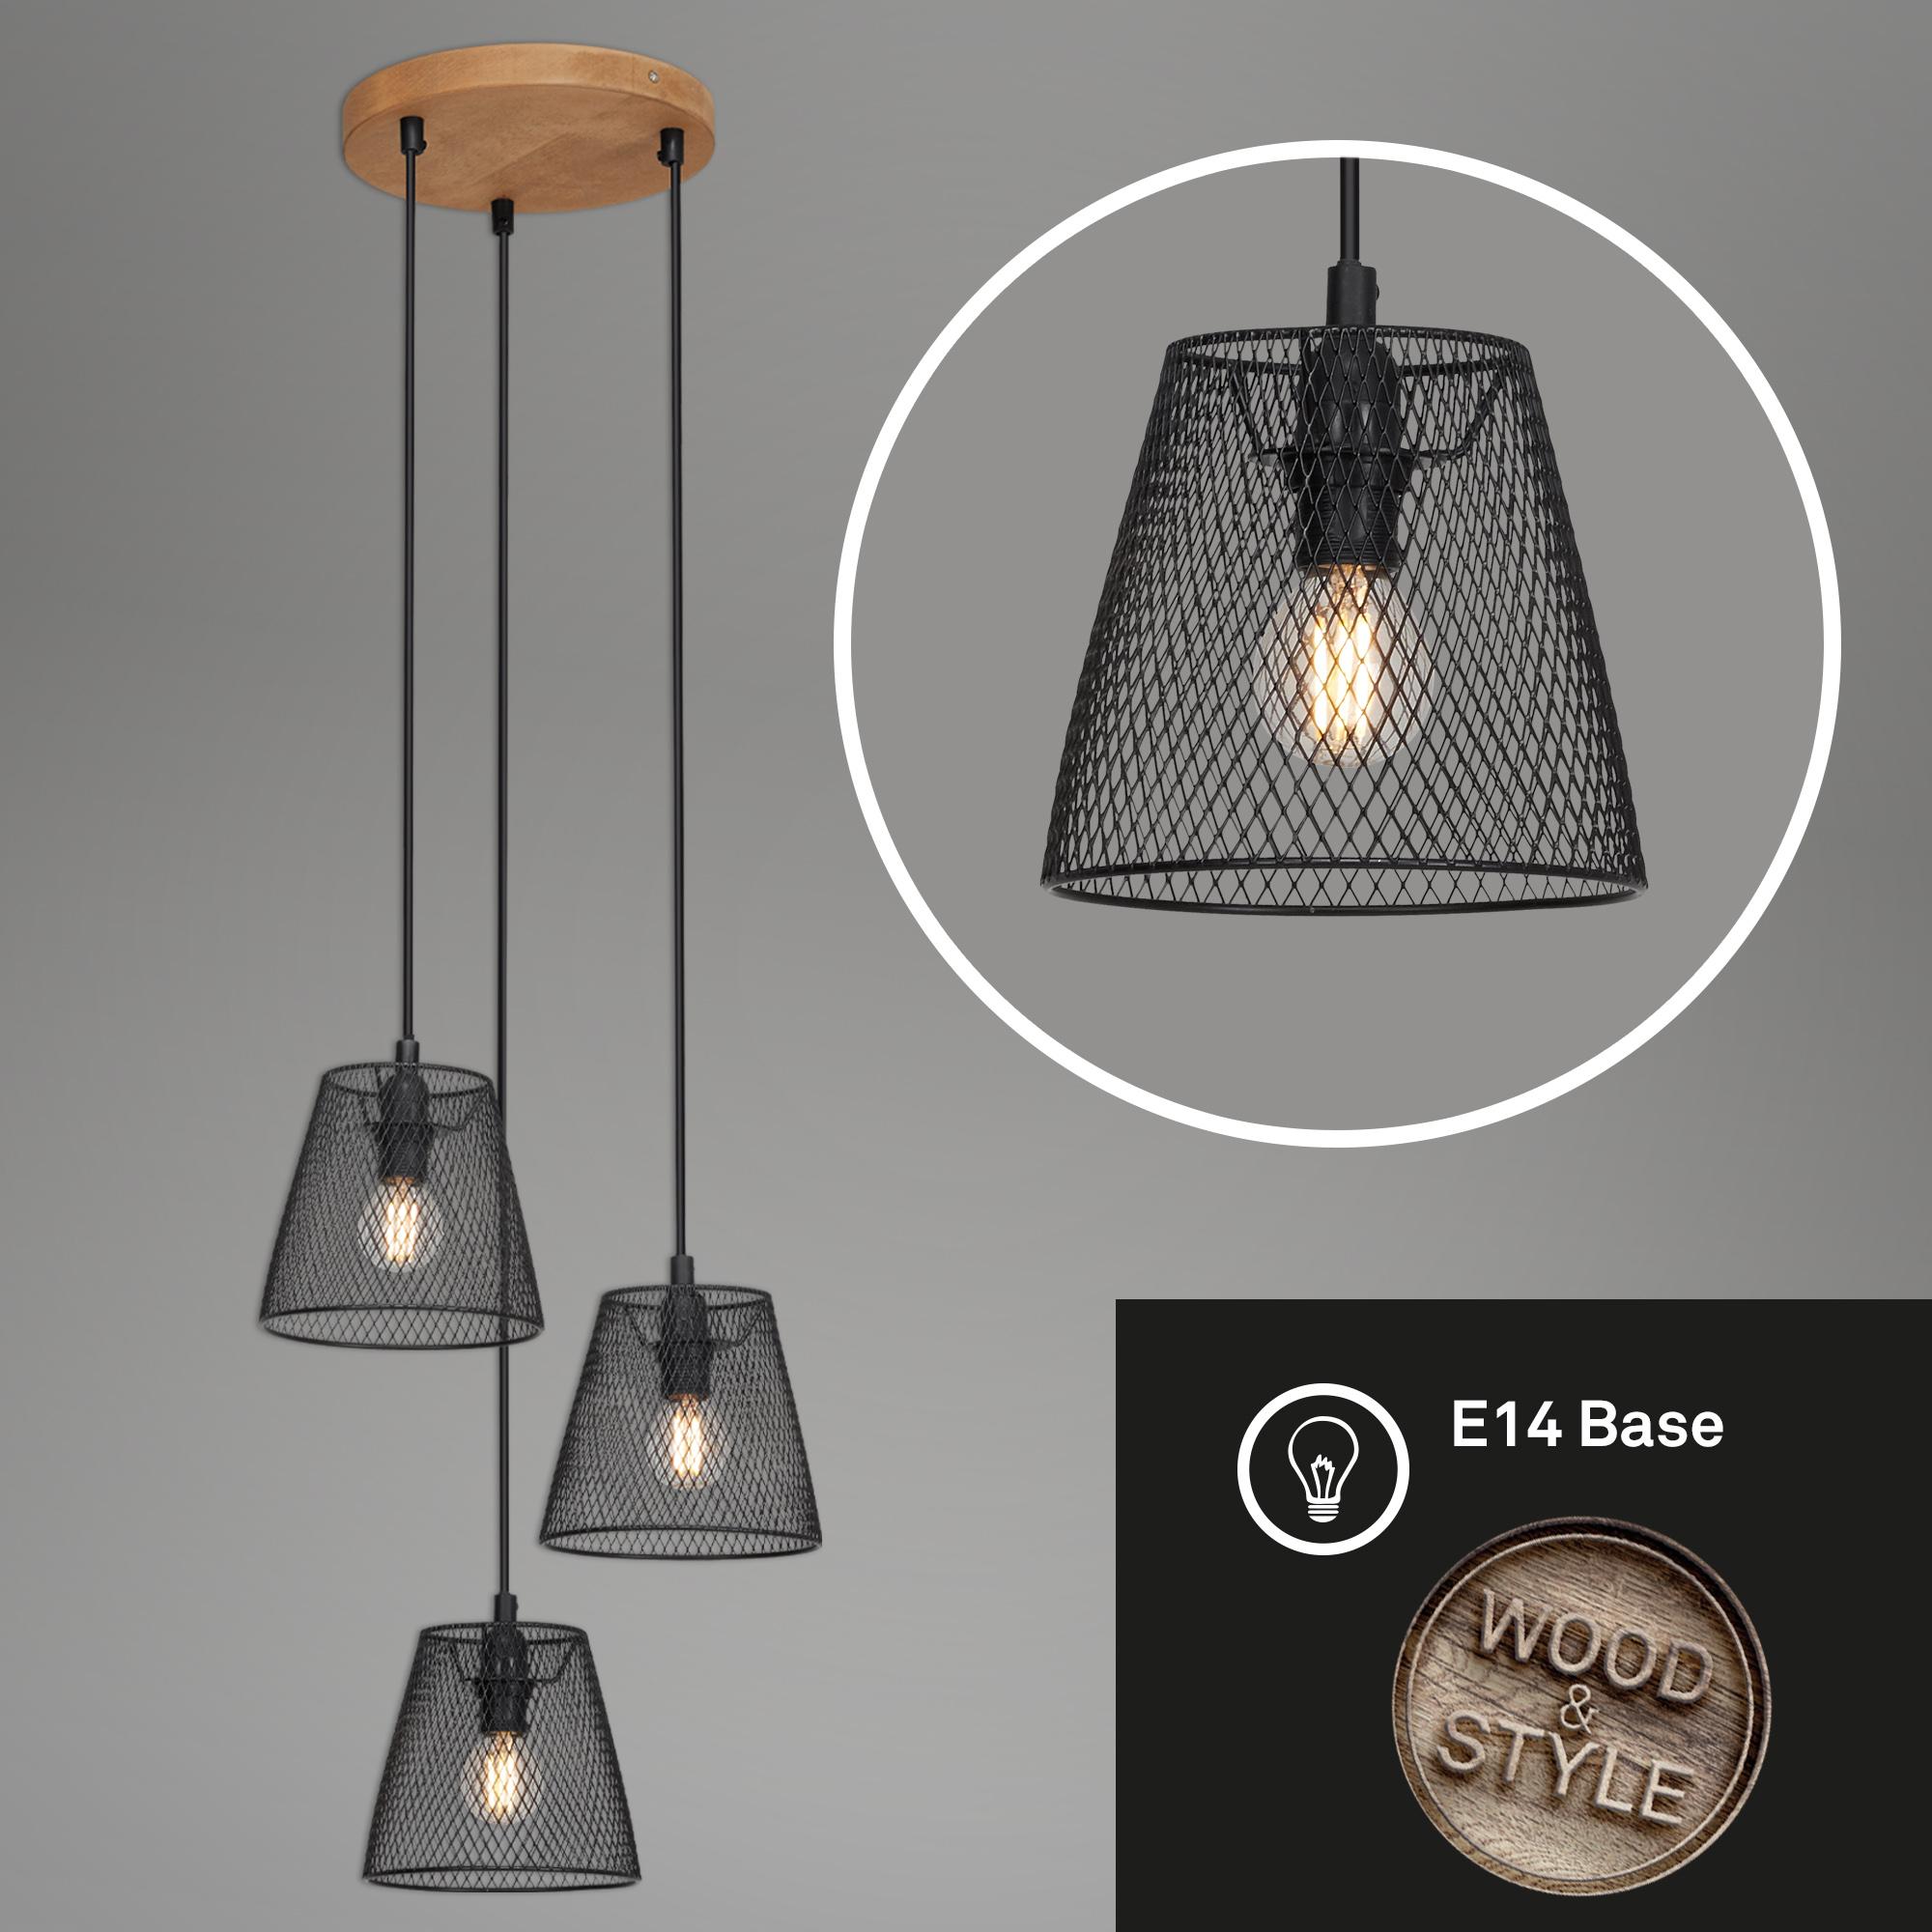 LED Pendelleuchte, Ø 21 cm, max. 40 W, Schwarz